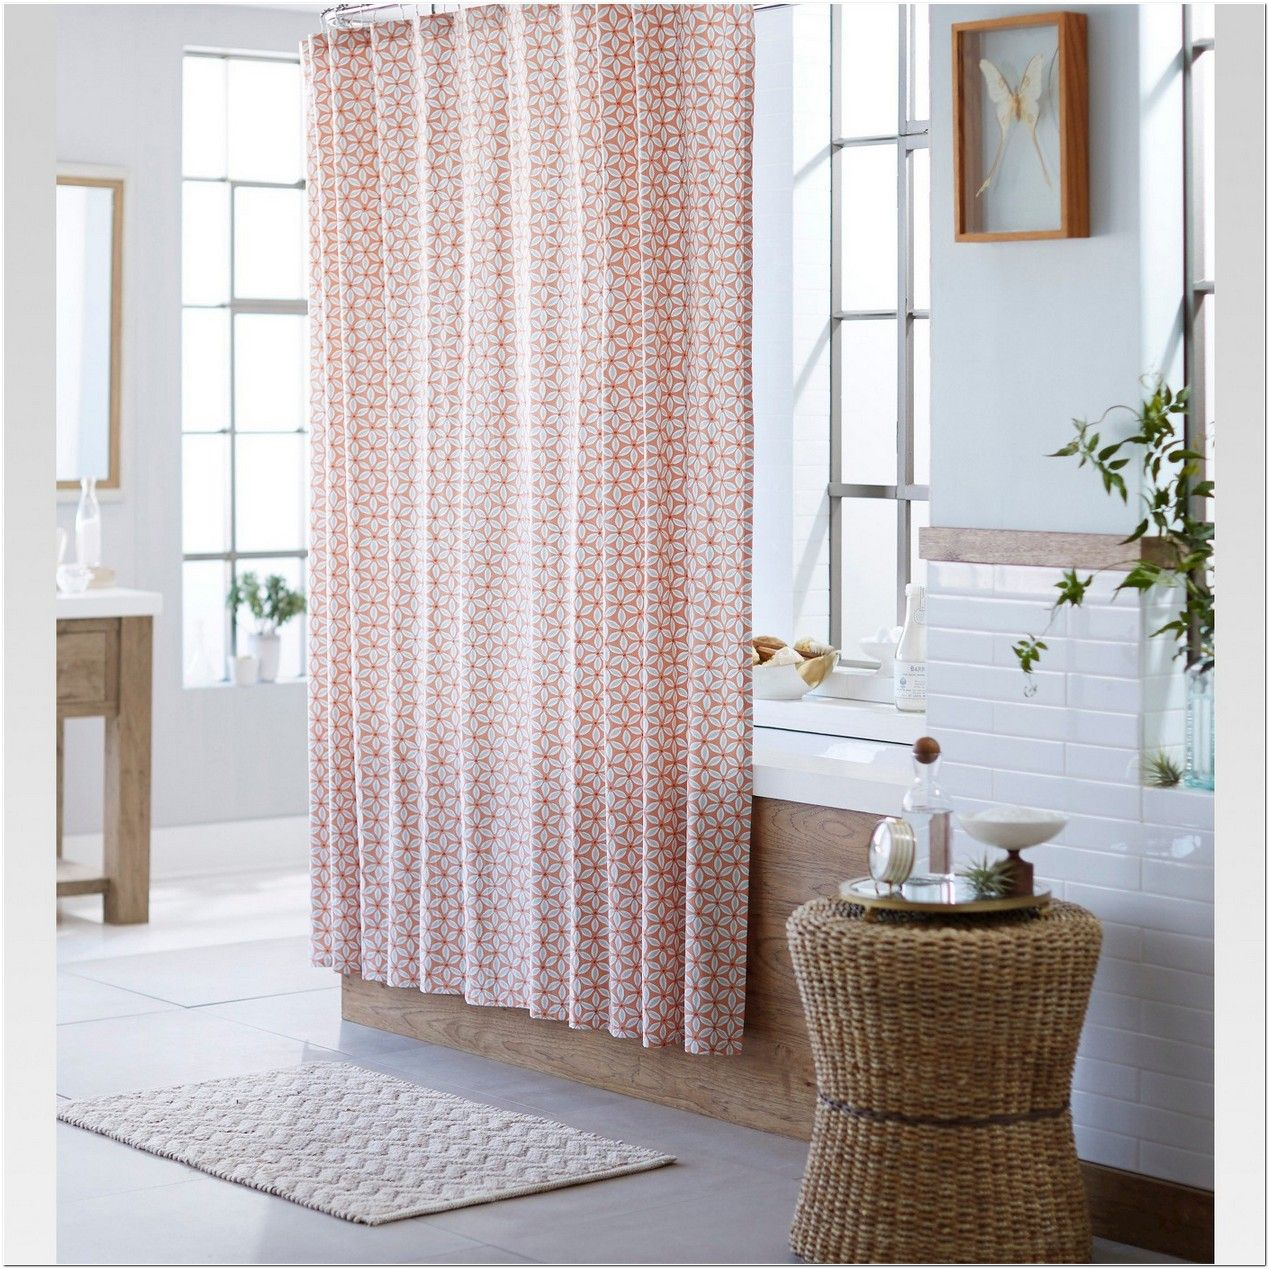 47 Amazing Joanna Gaines Bathroom Ideas Bathroomdesign